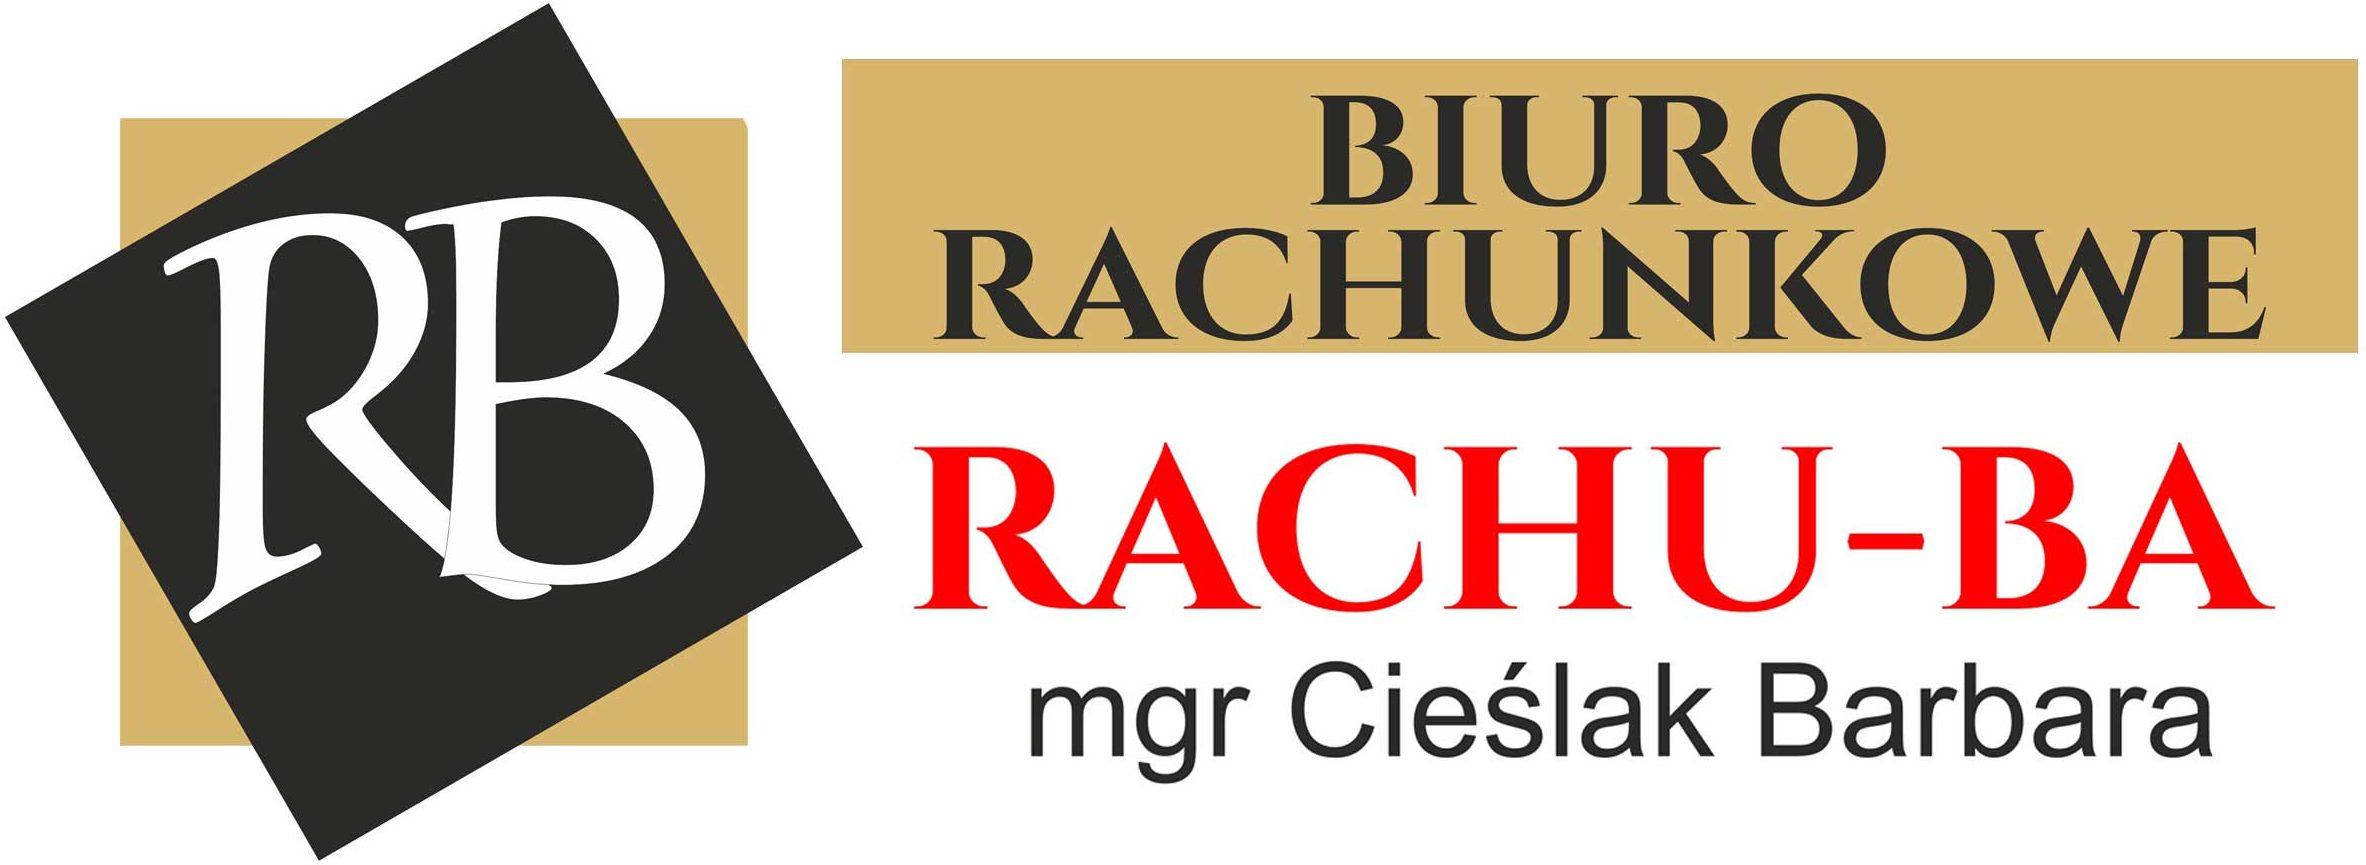 Biuro Rachunkowe Rachu-Ba